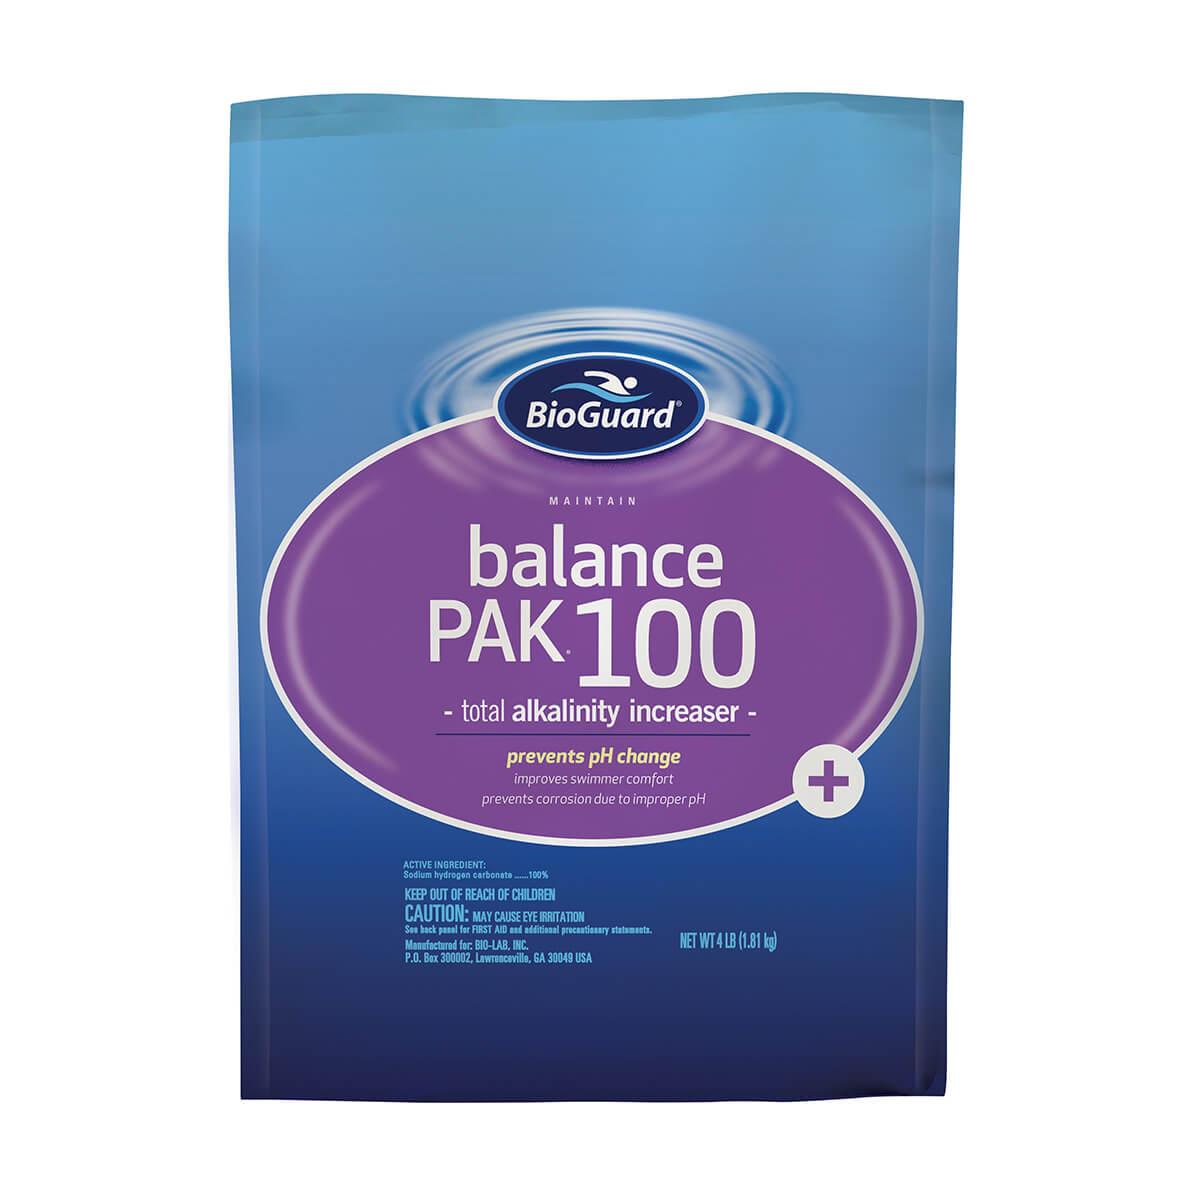 BioGuard Balance Pak 100